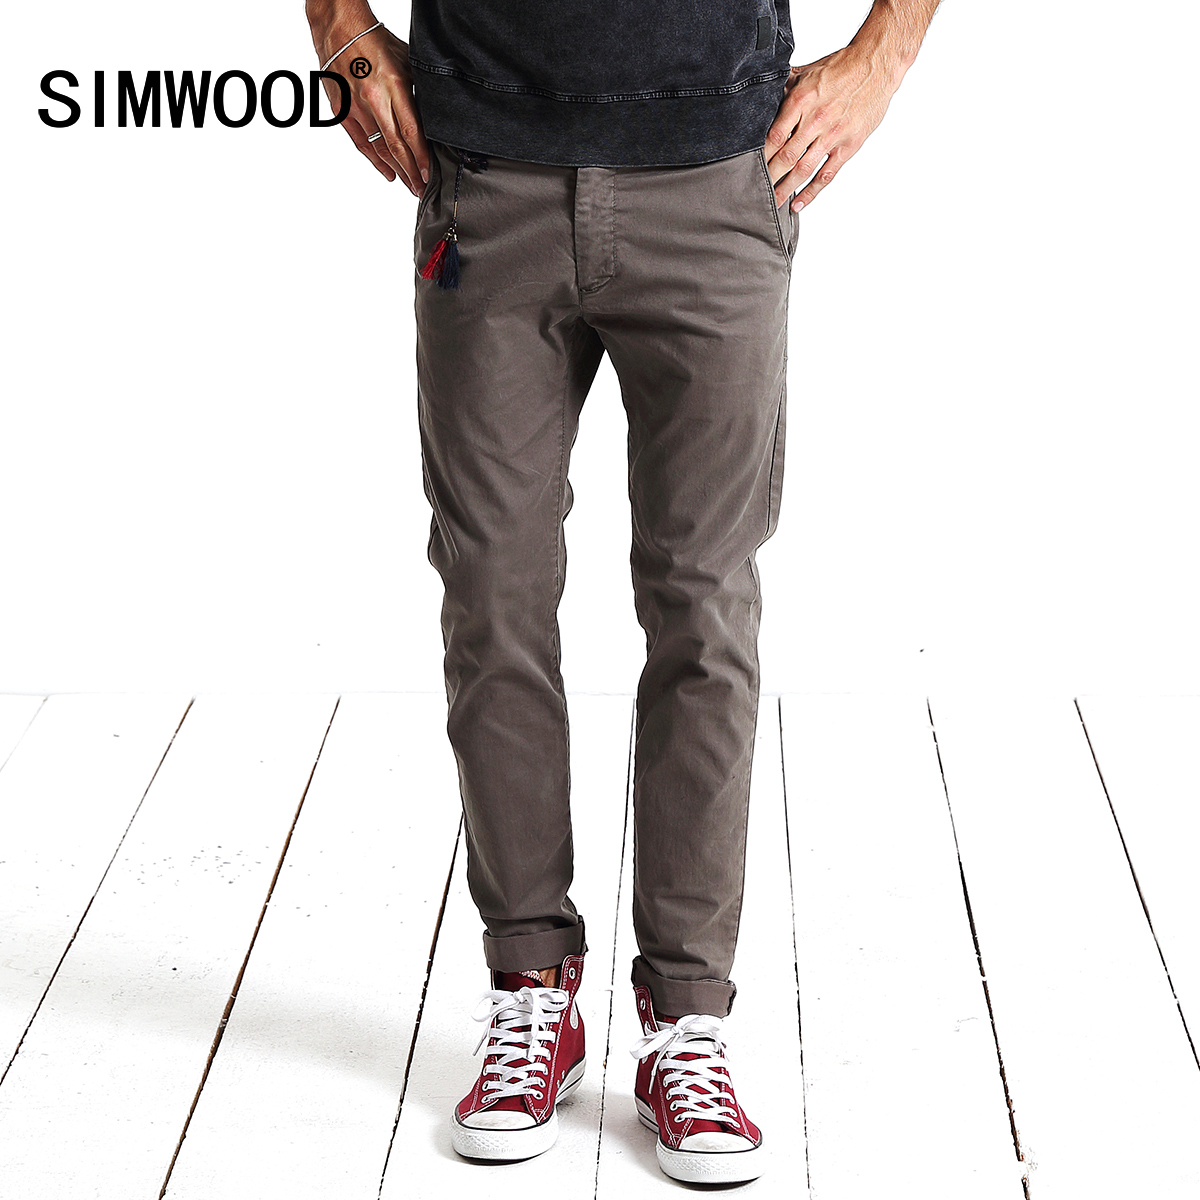 simwood吊墜小腳 褲